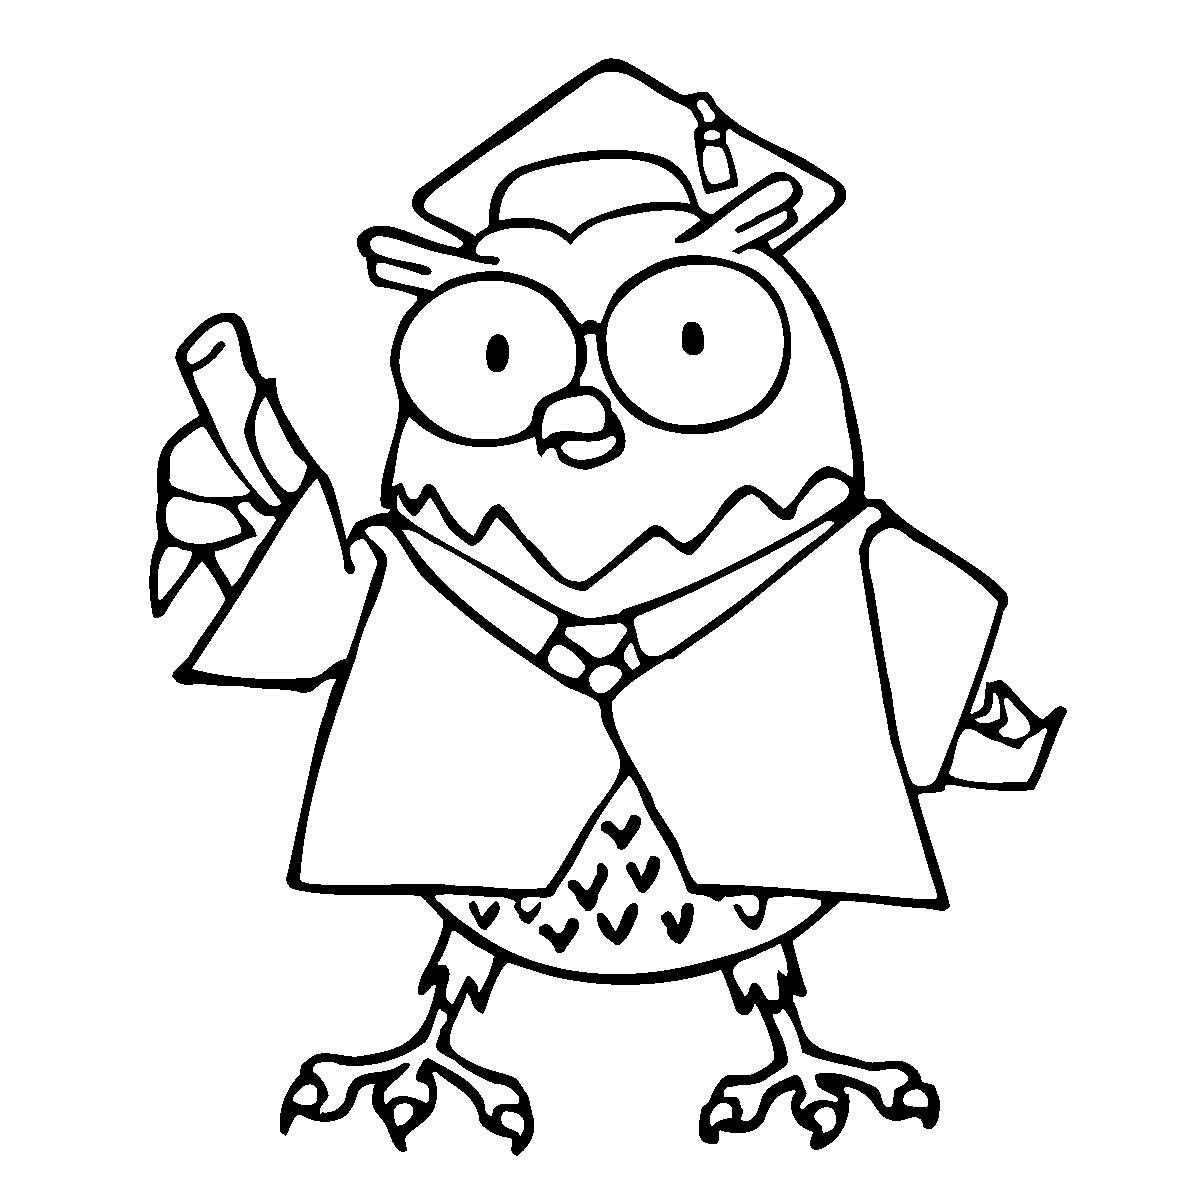 free clip art for teachers cliparts co Cartoon Clock Alarm Clock Clip Art